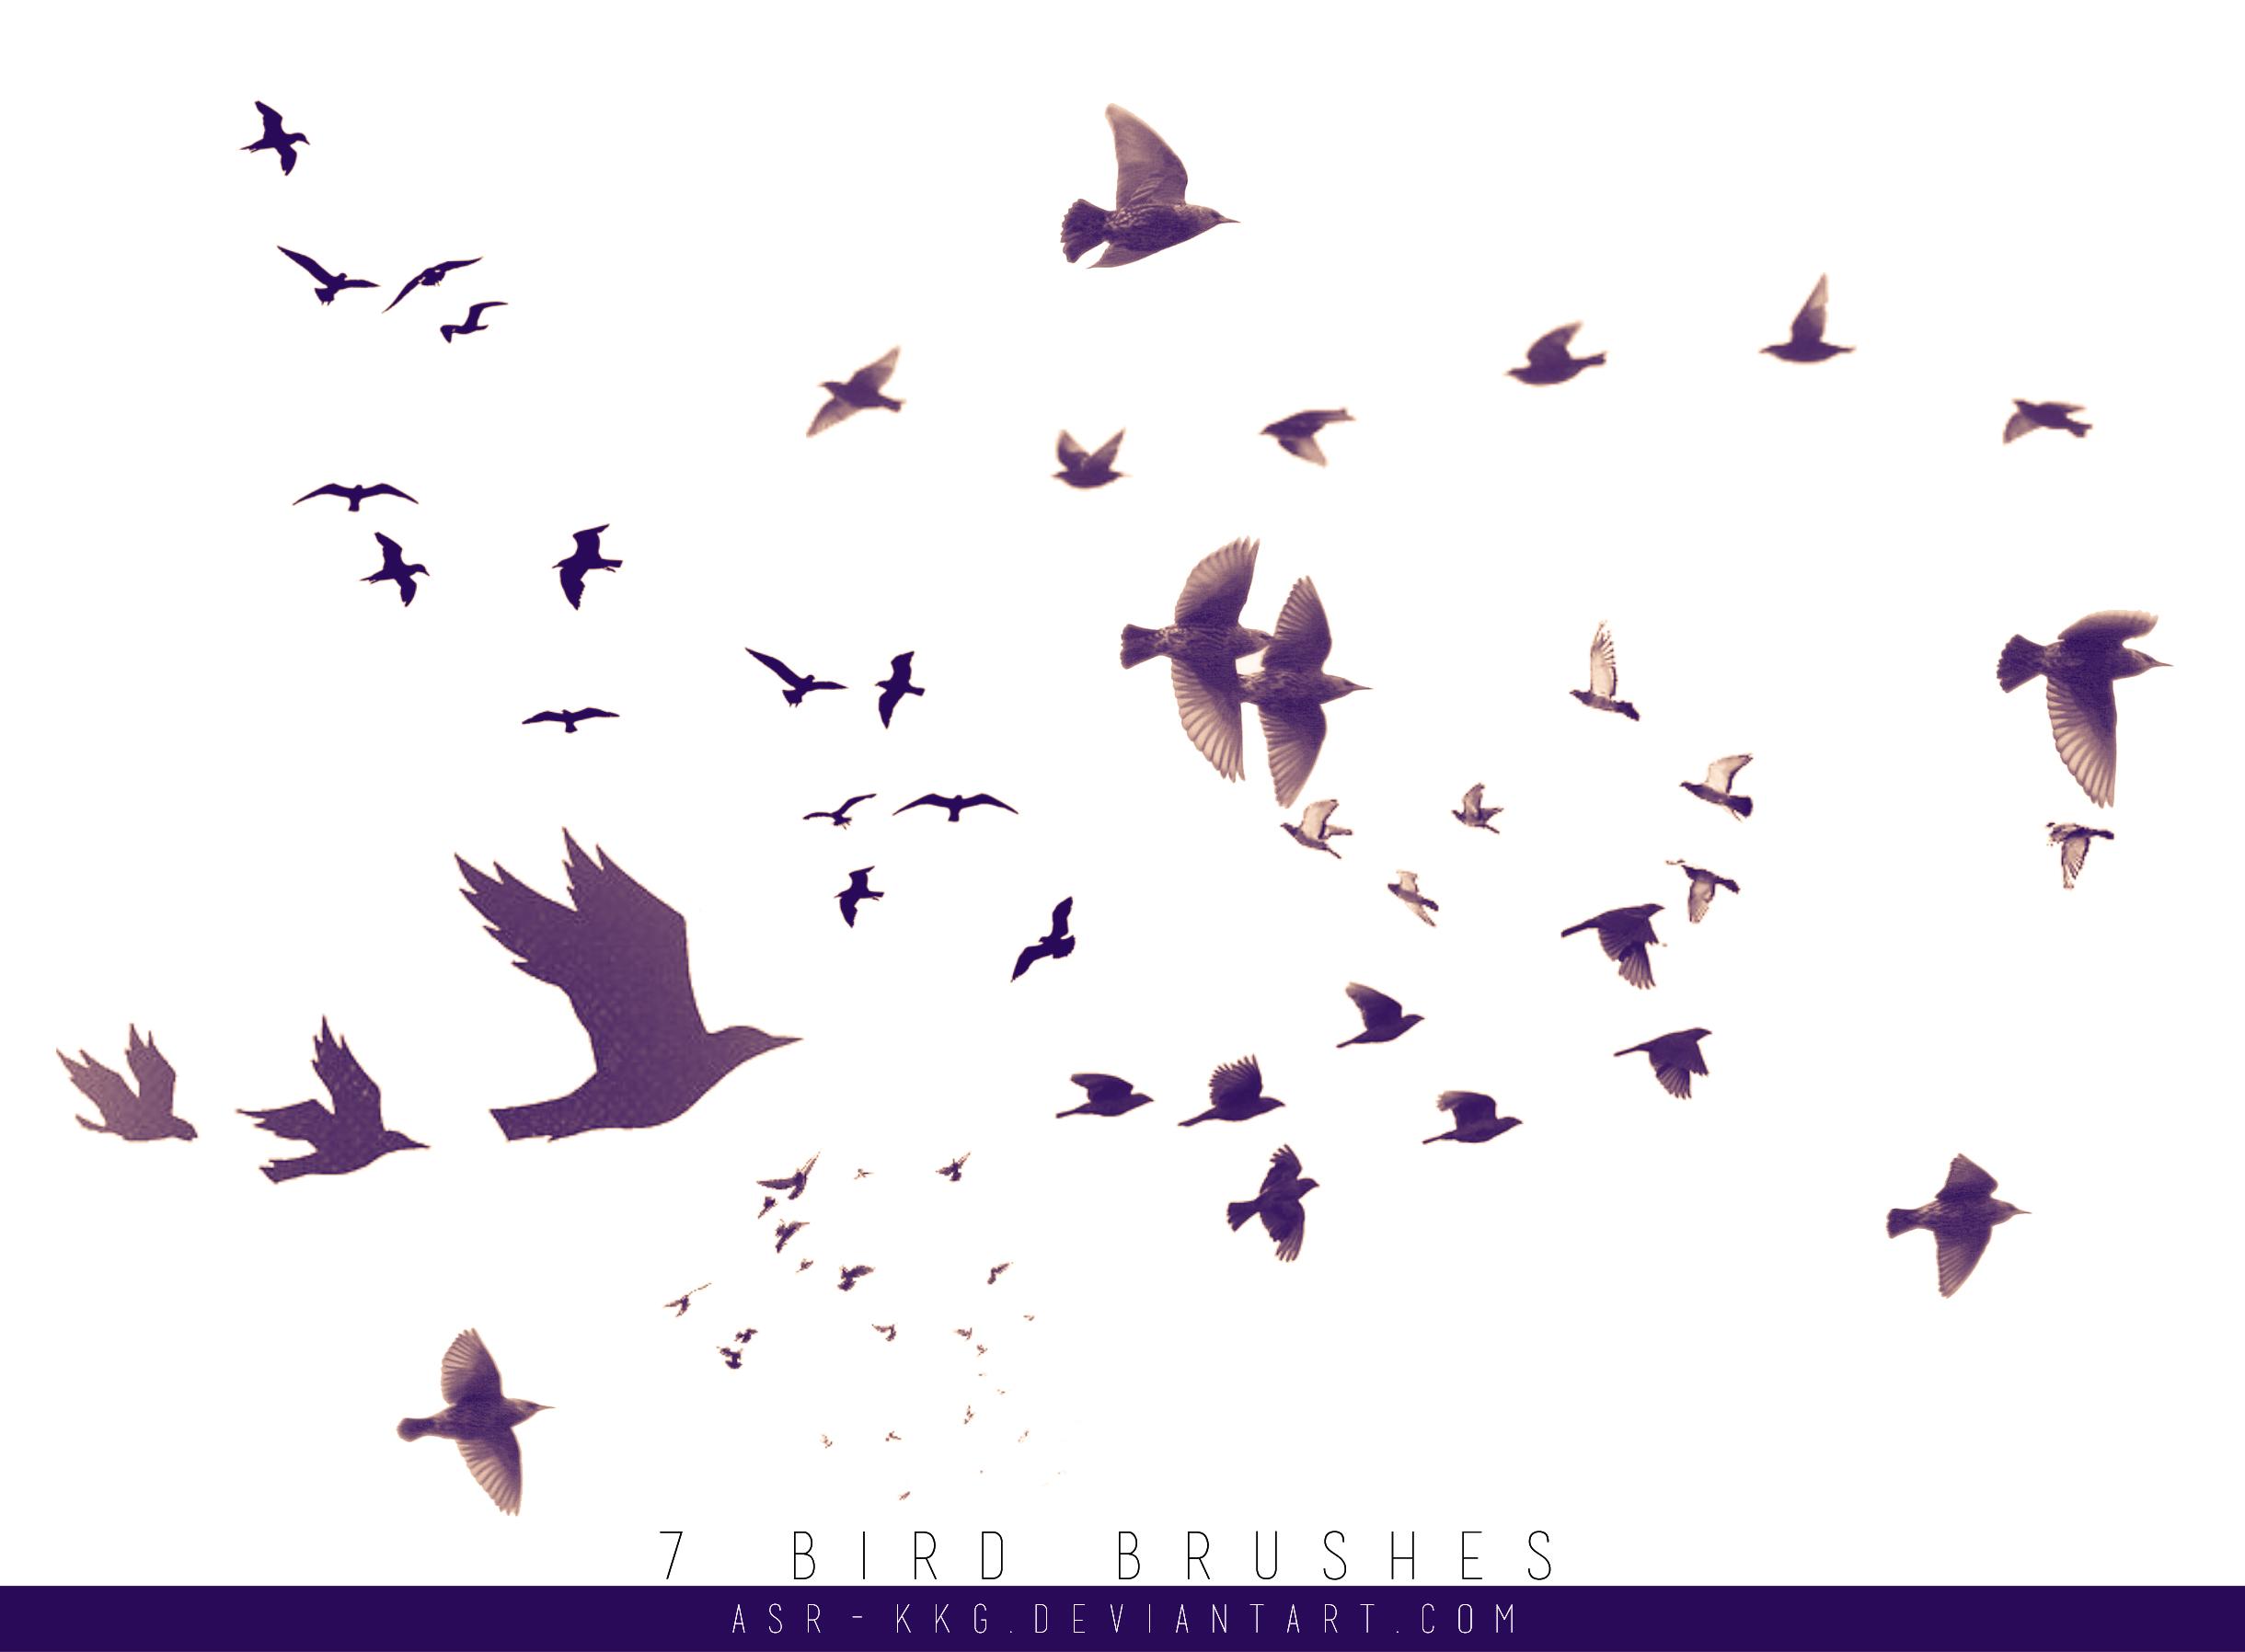 | 7 - B I R D S   B R U S H E S | by Dear-Raven